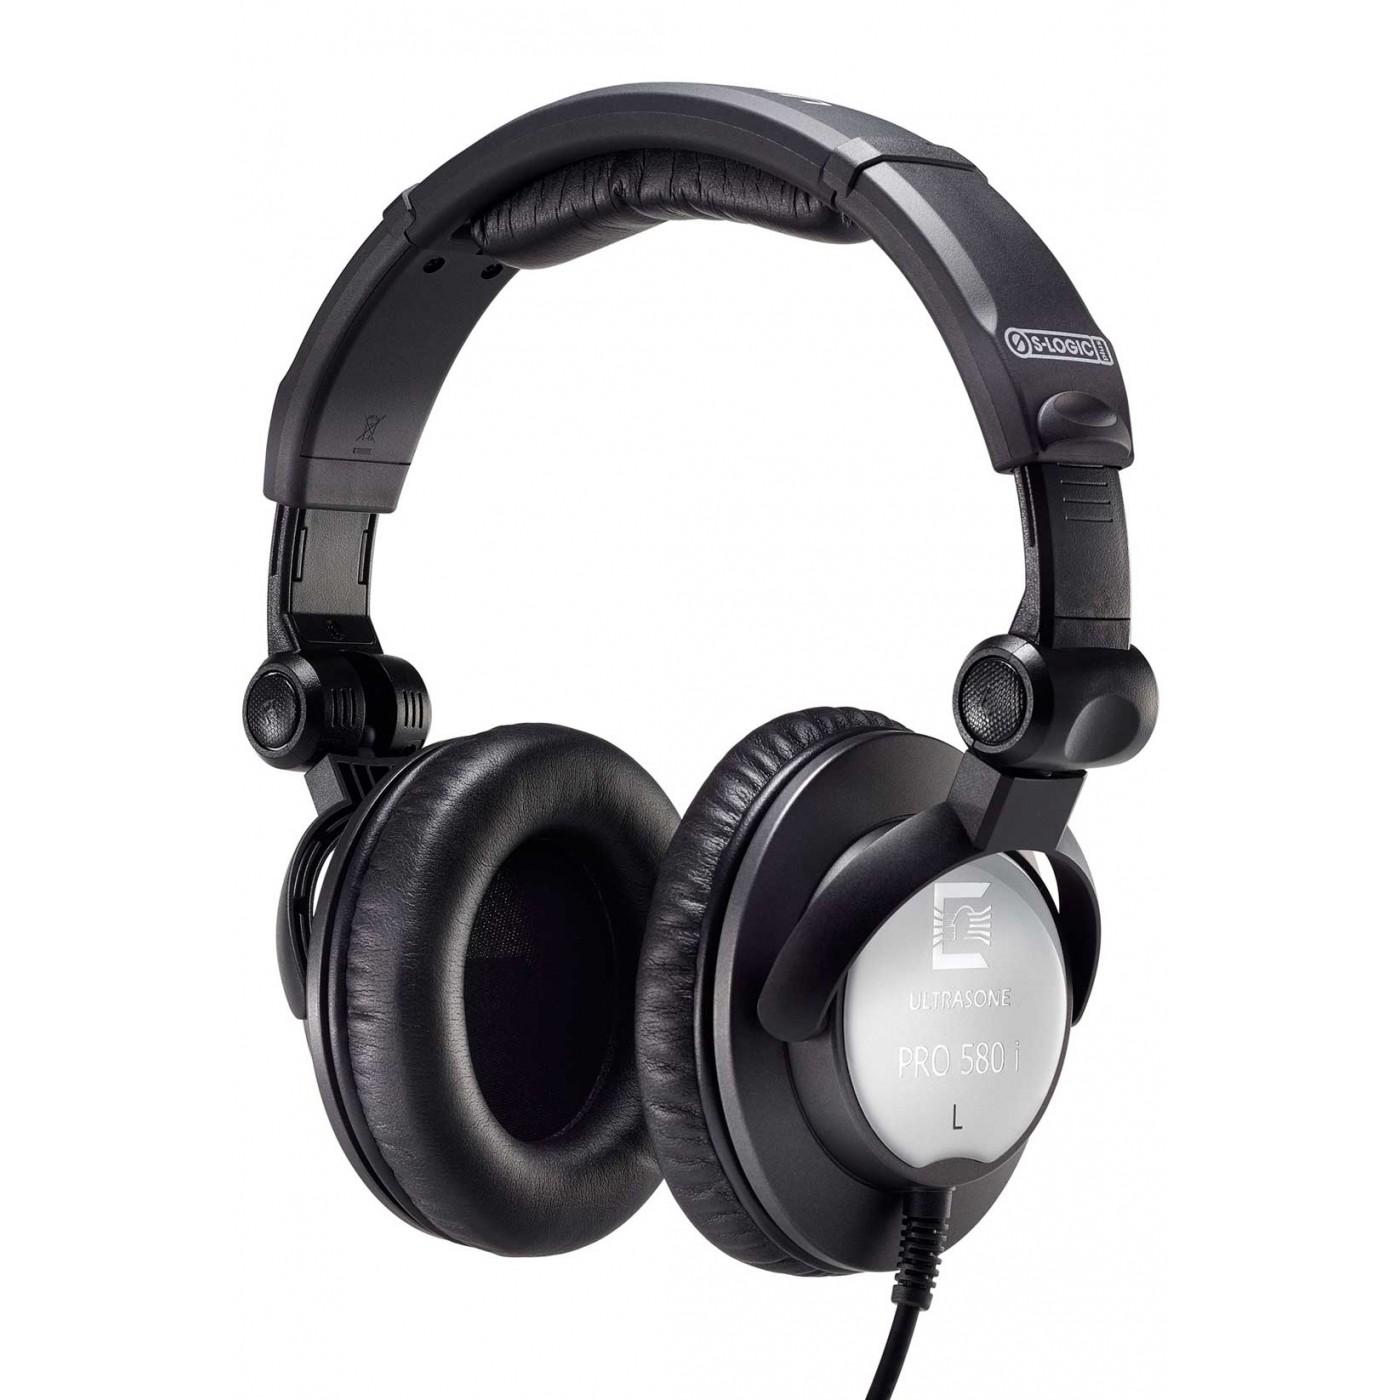 Ultrasone PRO-580i | Rage Audio